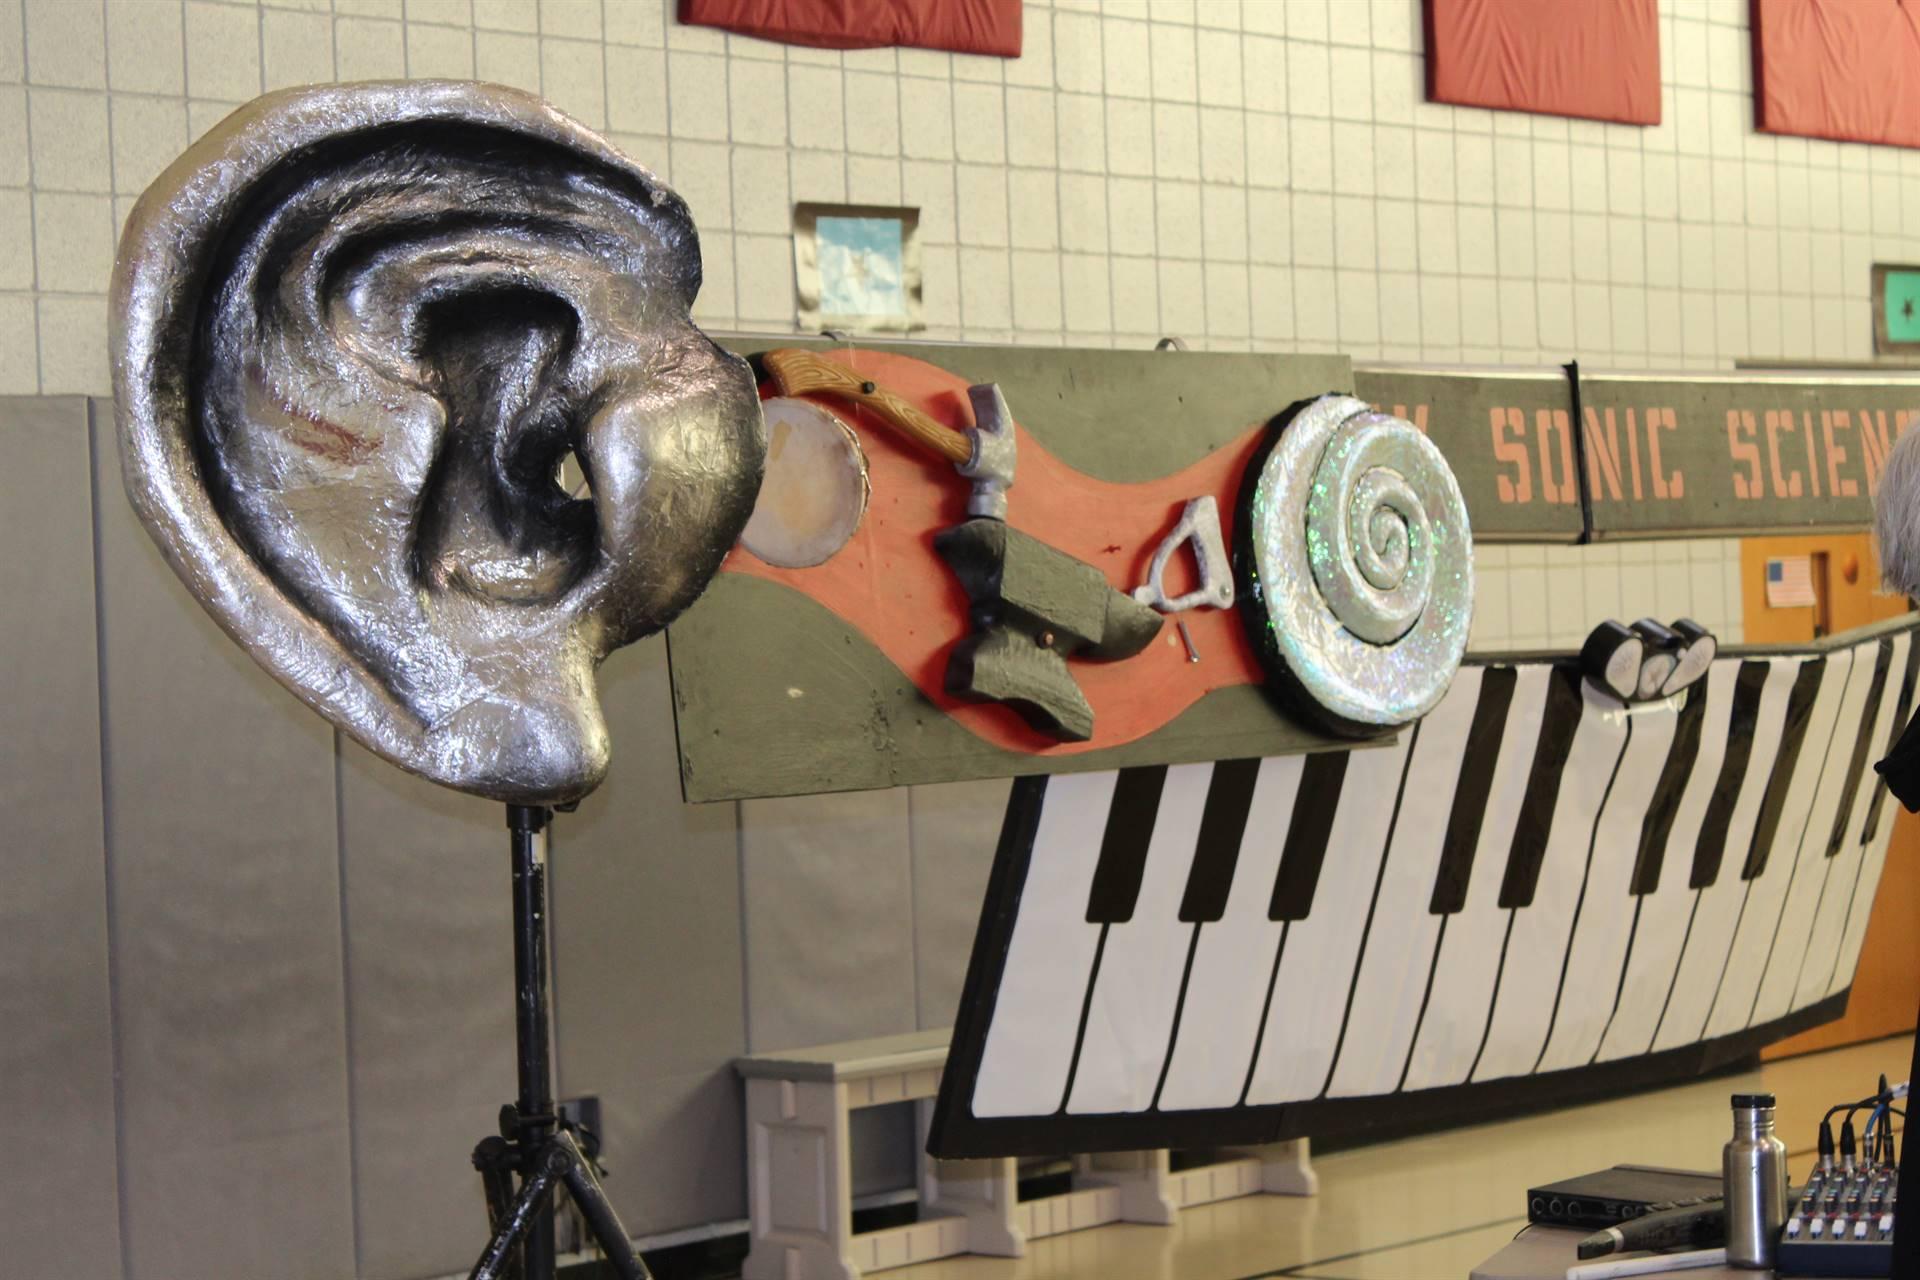 Squonk Opera assembly backdrop